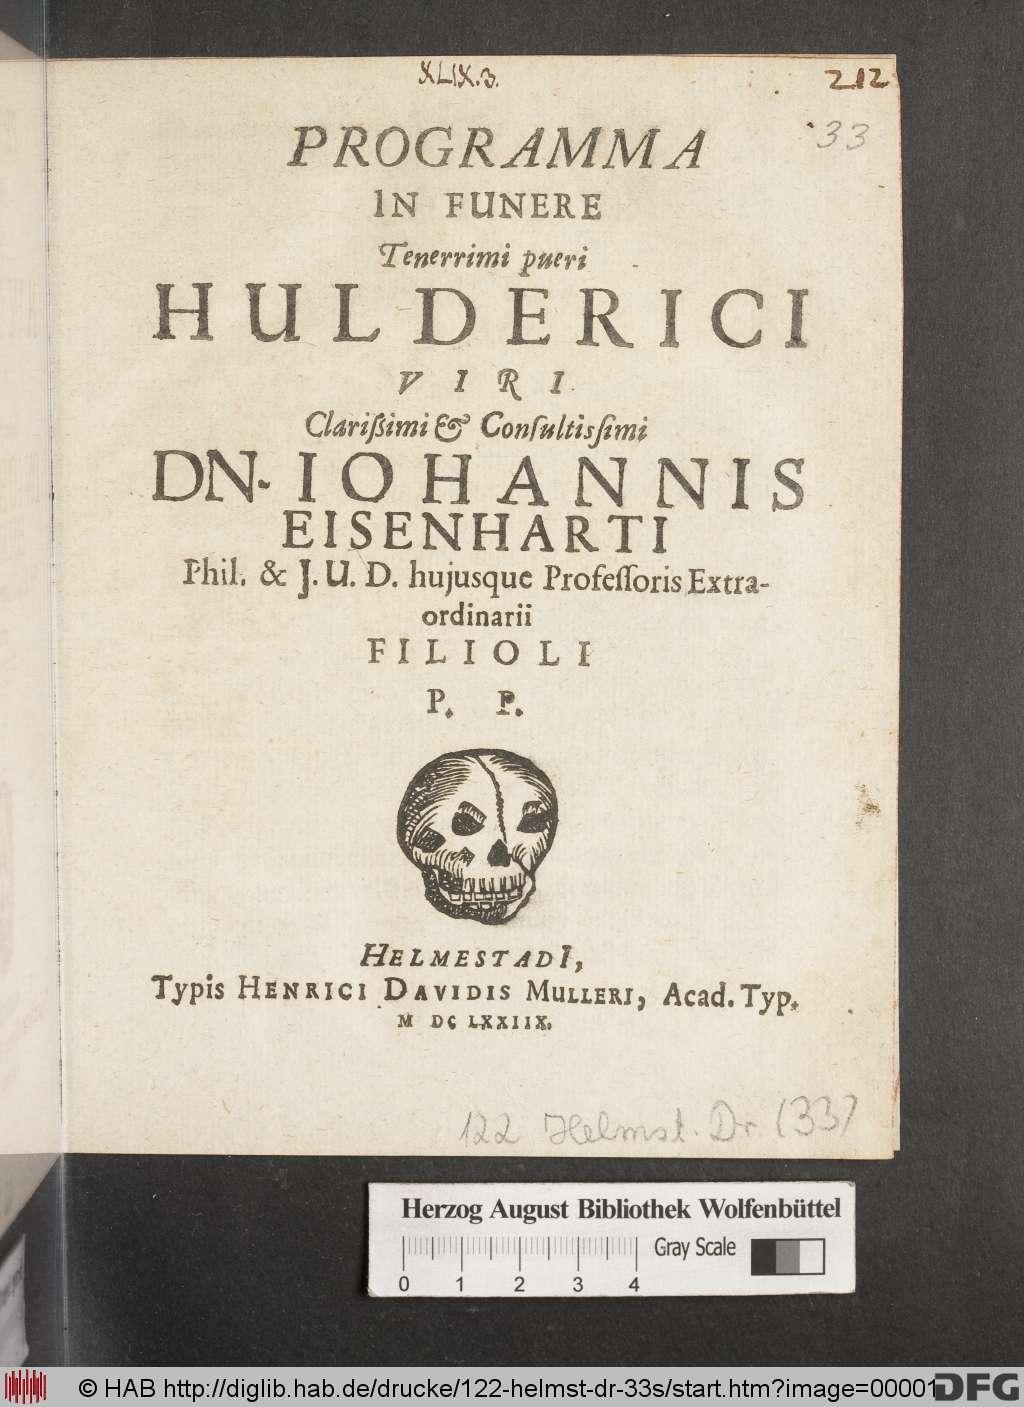 http://diglib.hab.de/drucke/122-helmst-dr-33s/00001.jpg